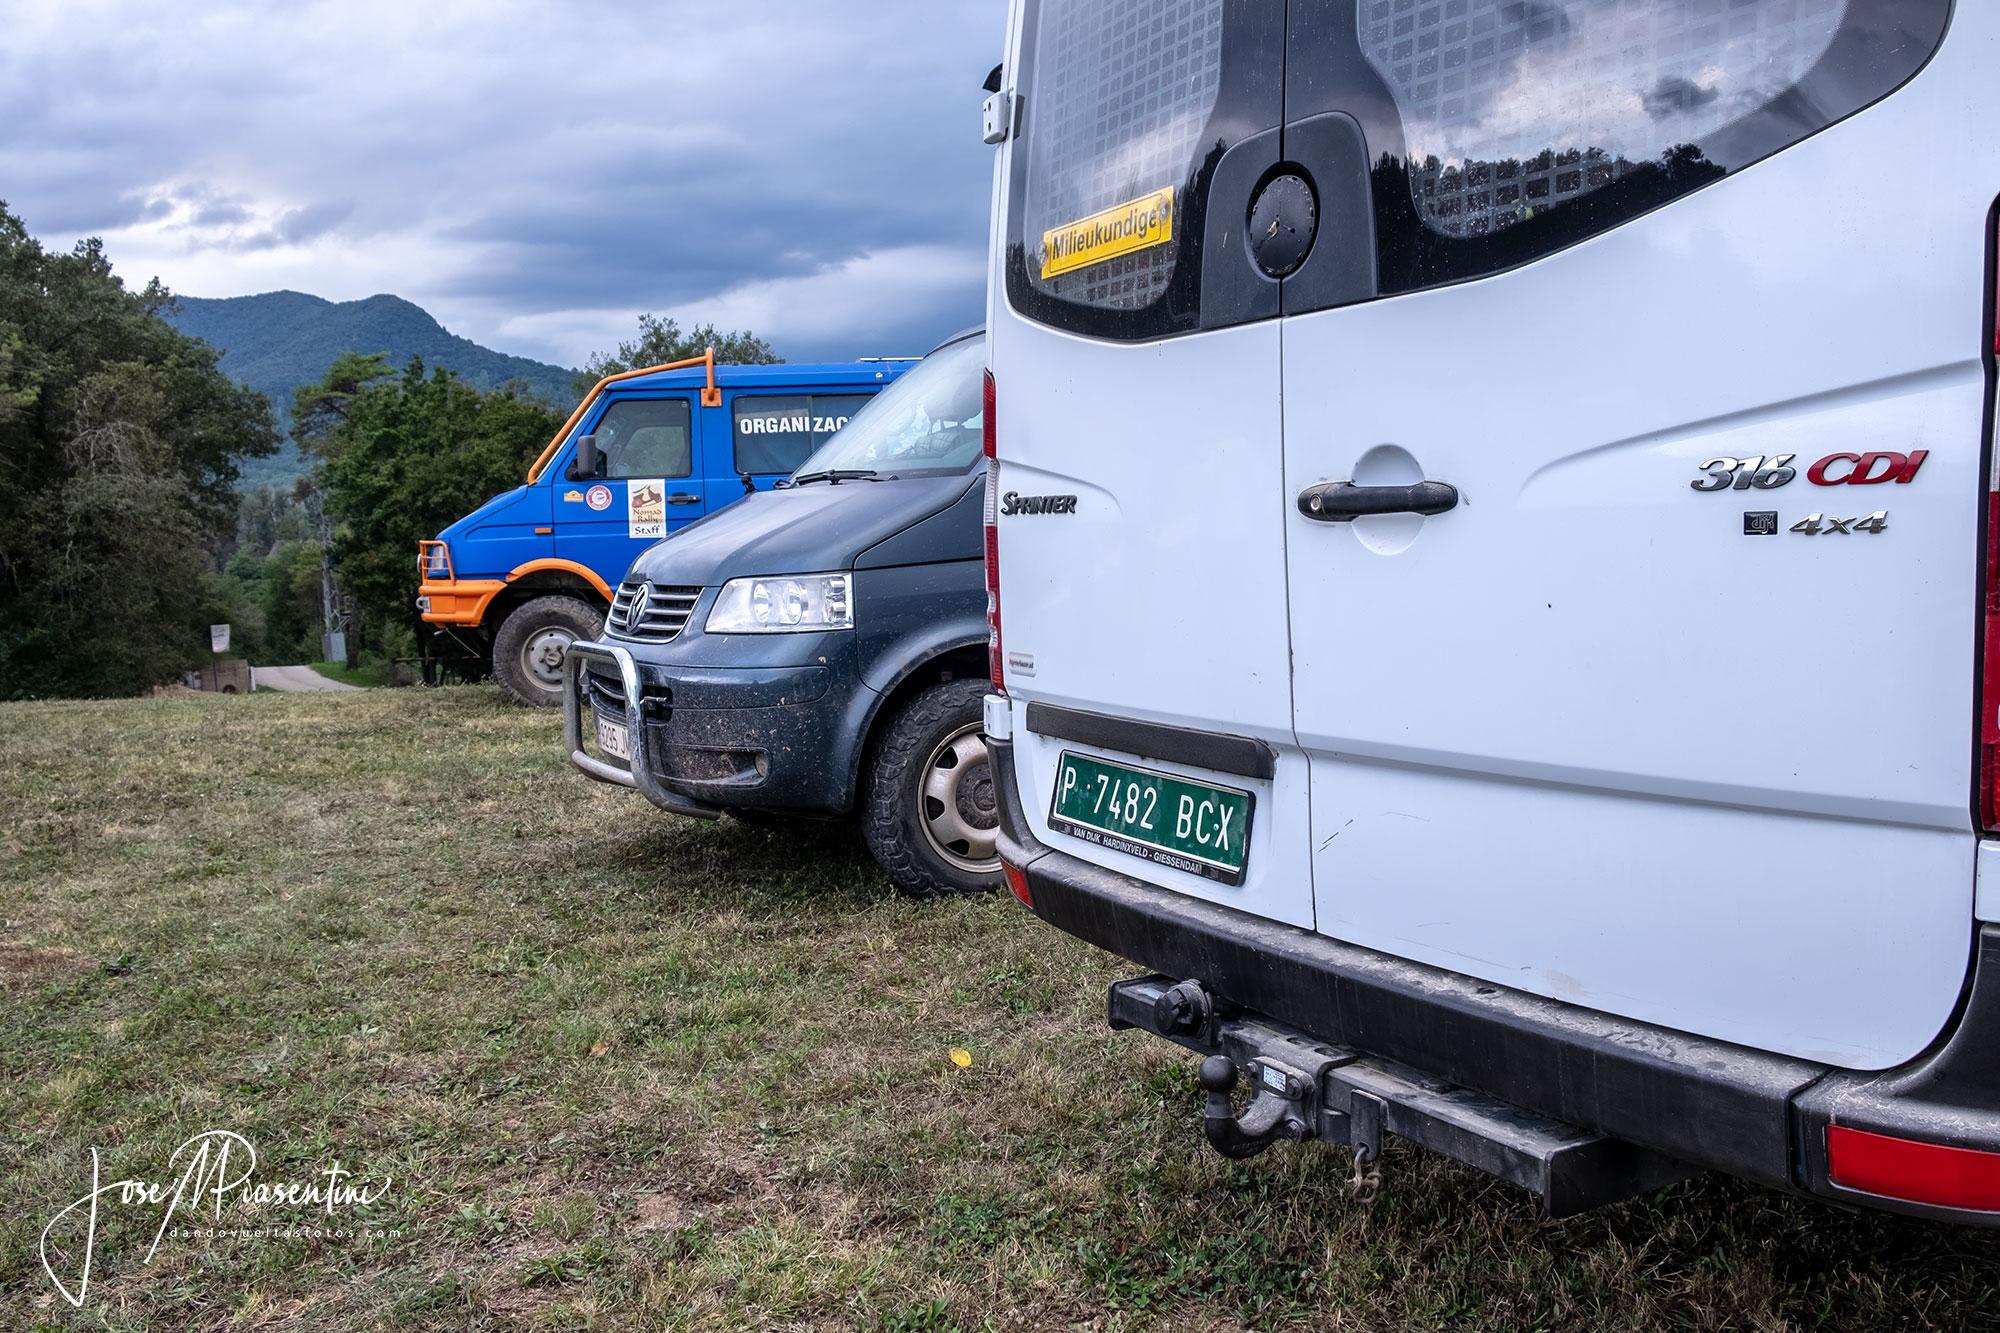 Sprinter 316 4x4 Camper